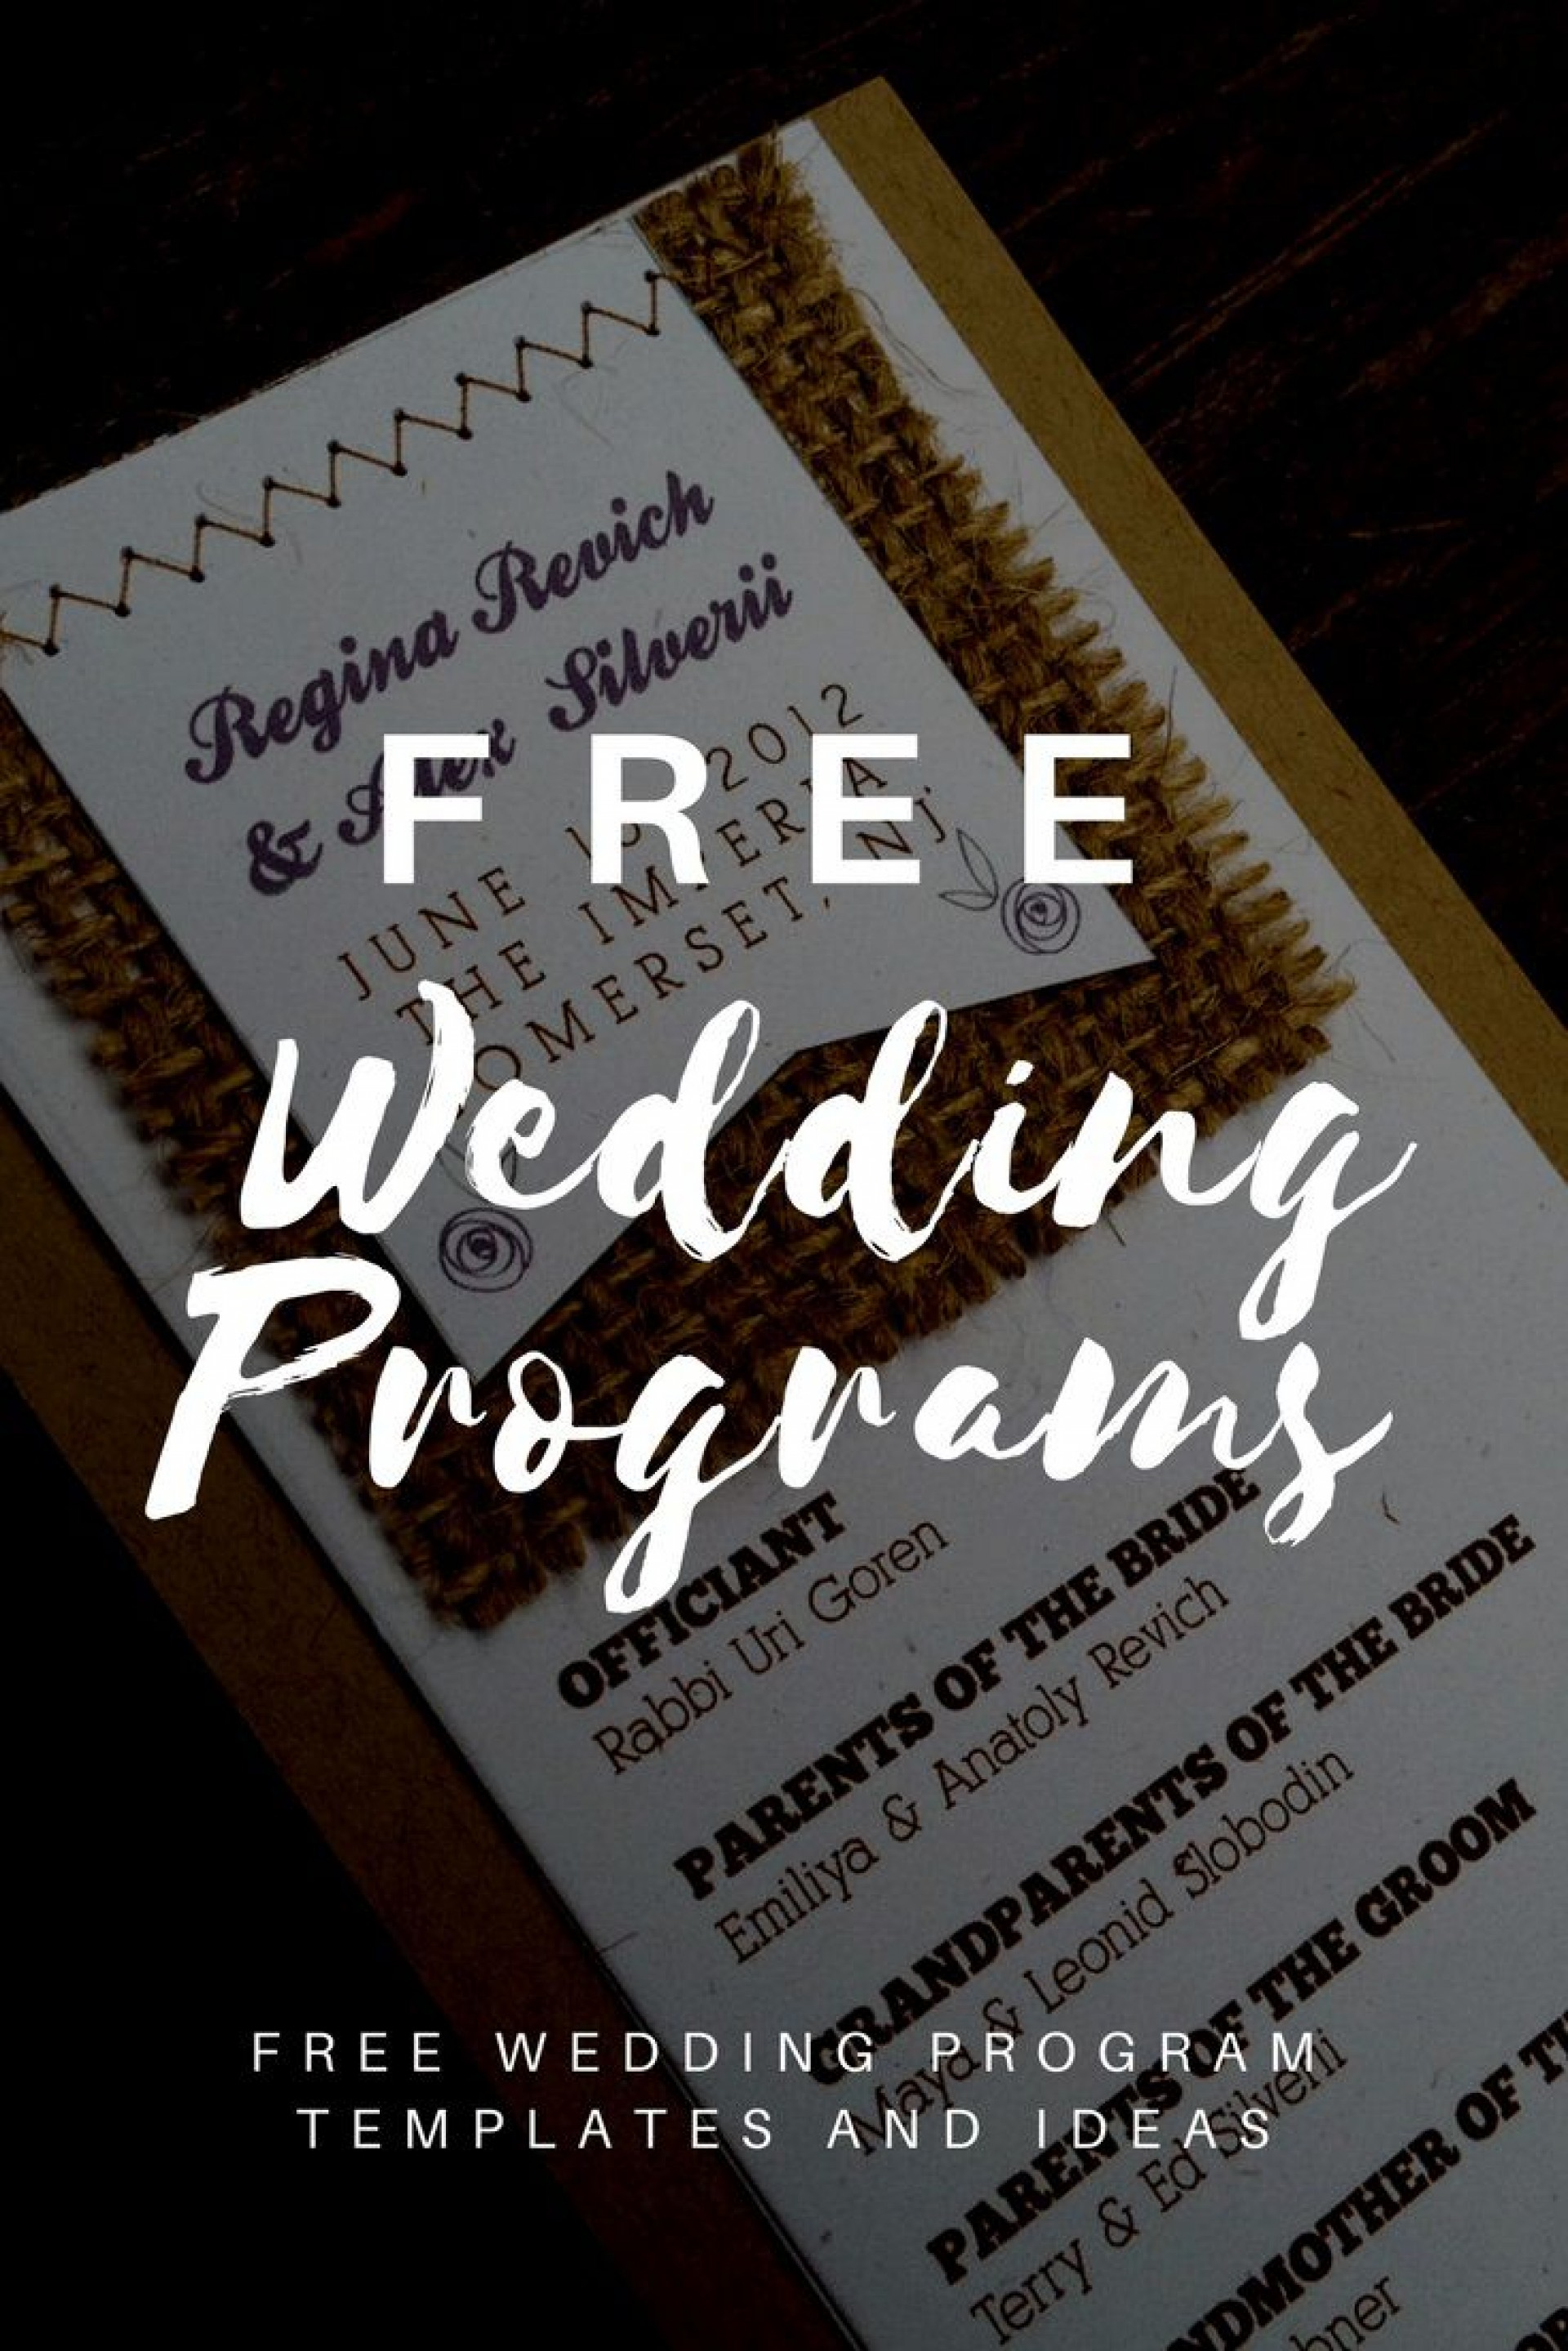 008 Outstanding Free Wedding Program Template High Resolution  Templates Pdf Download Fan Word1920